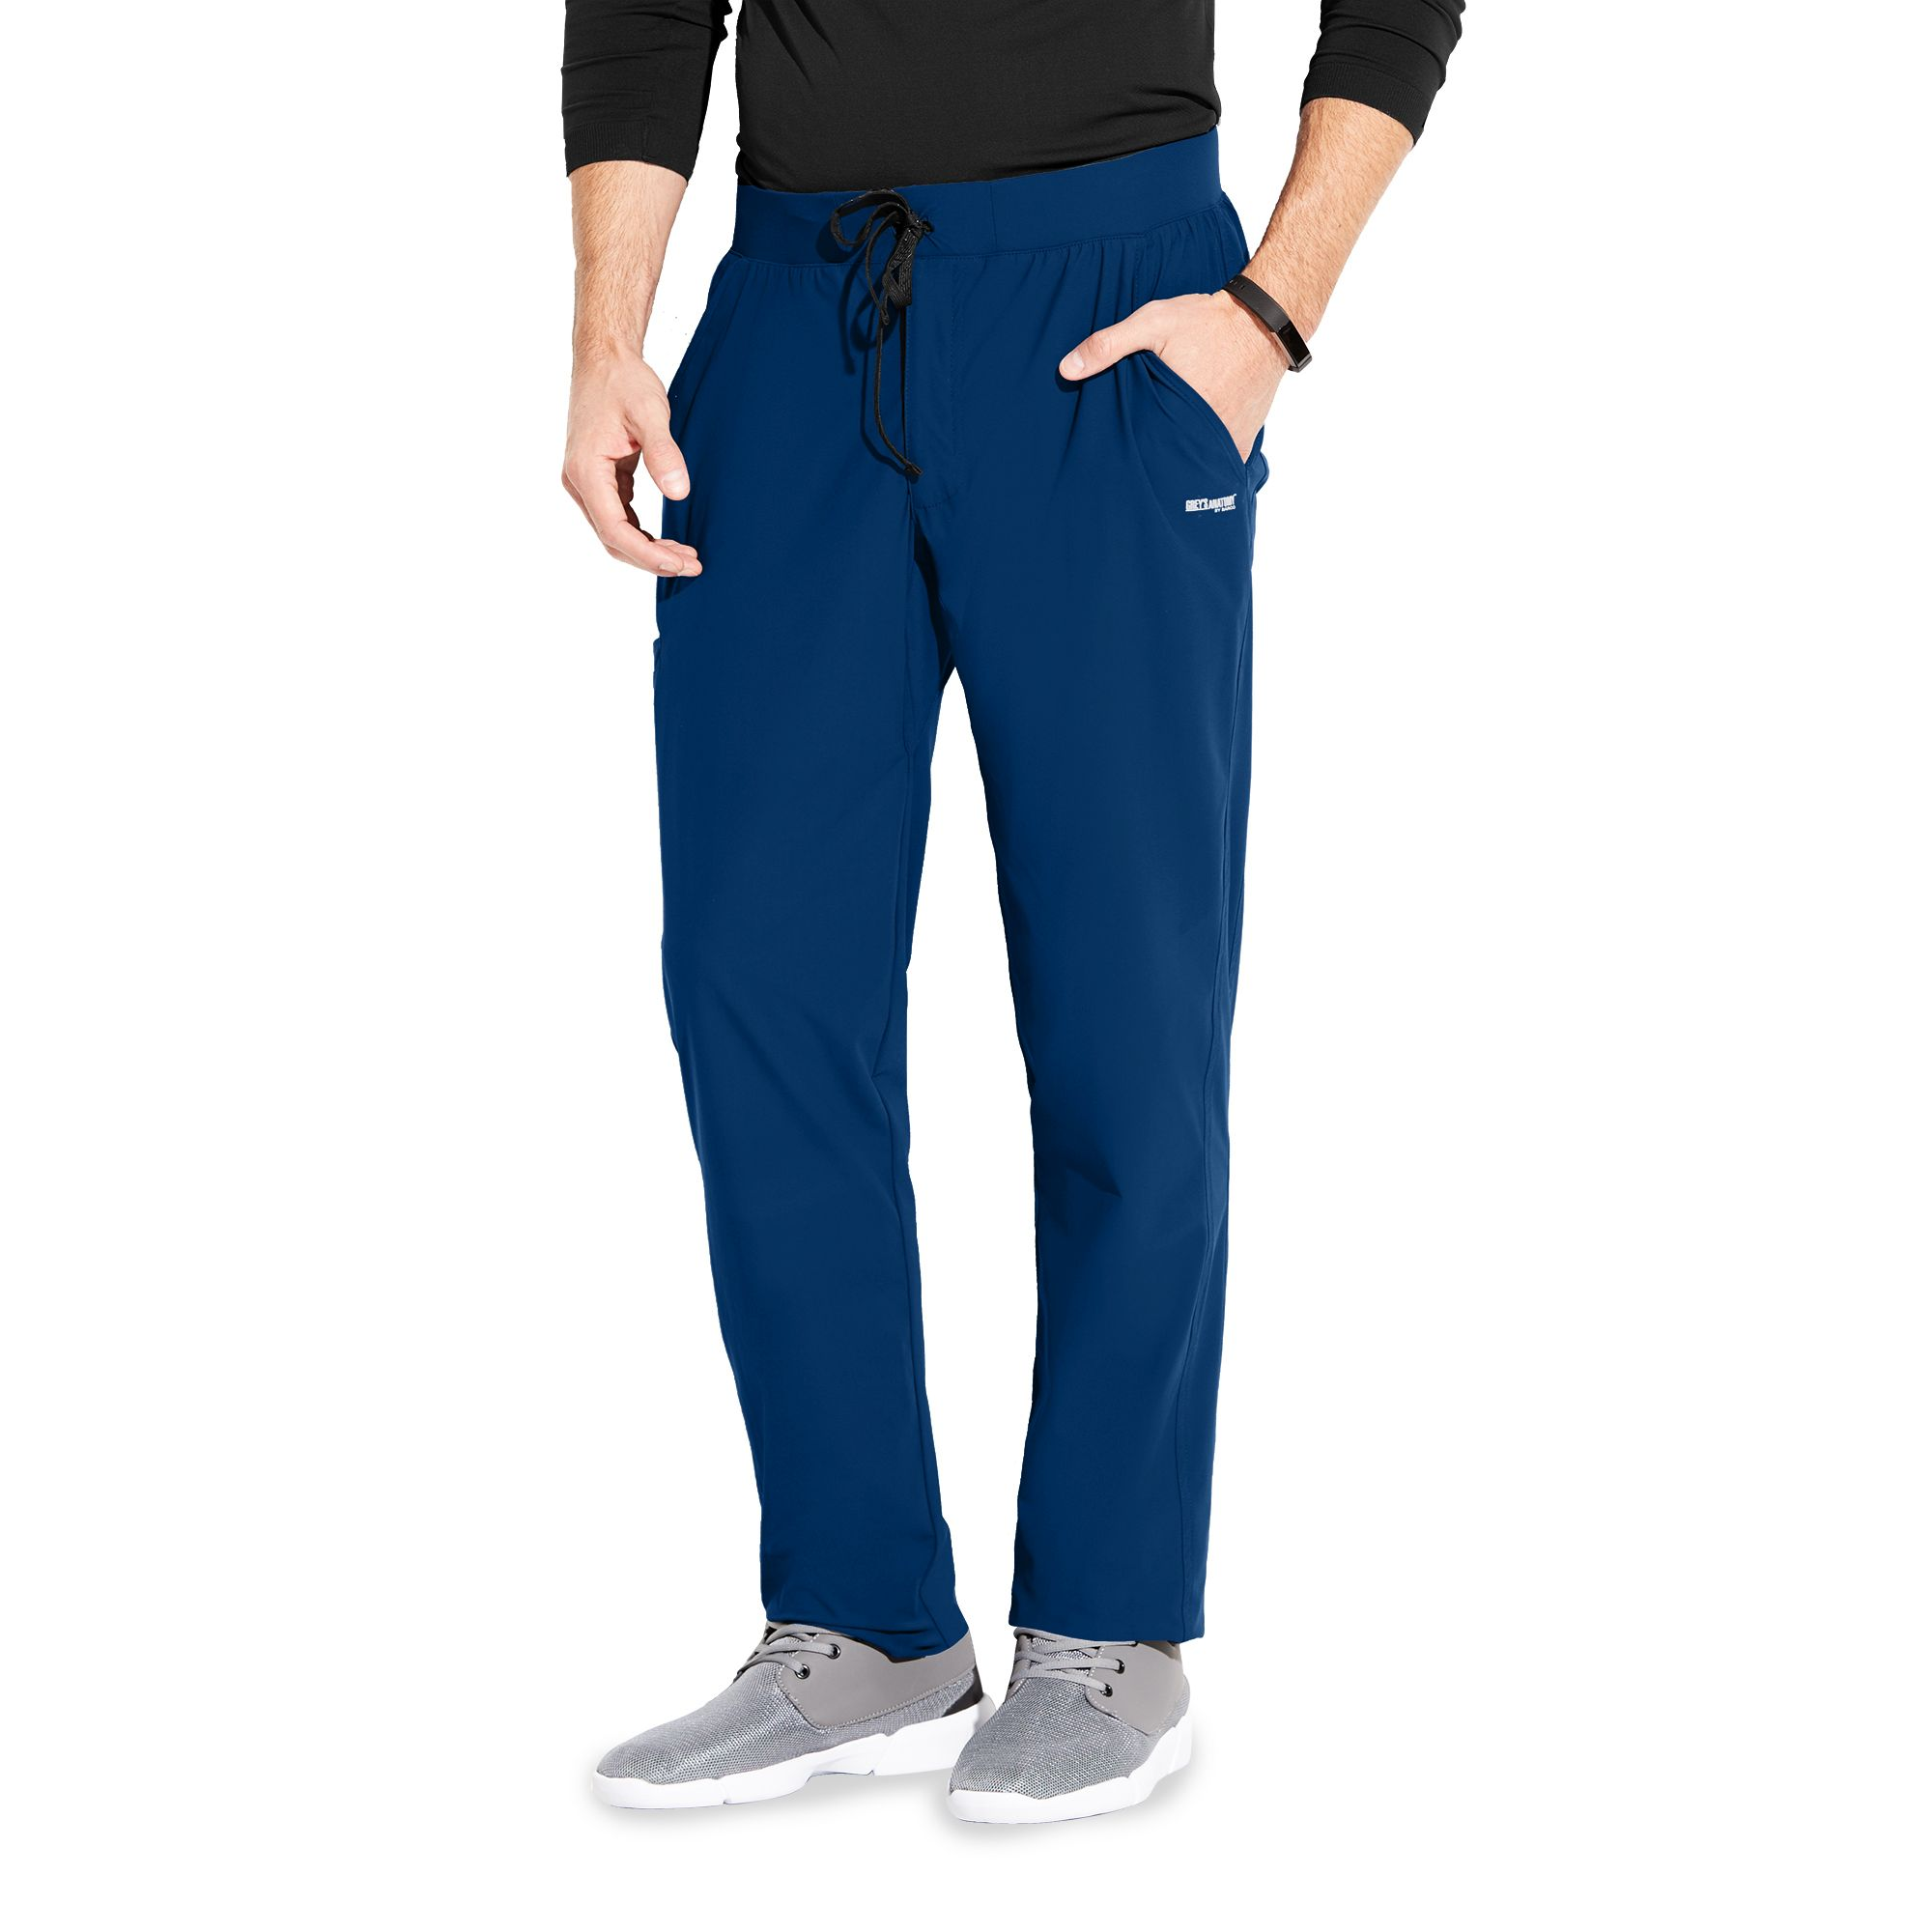 EDGE - NEW Men's 4 Pocket Gusset Pant-